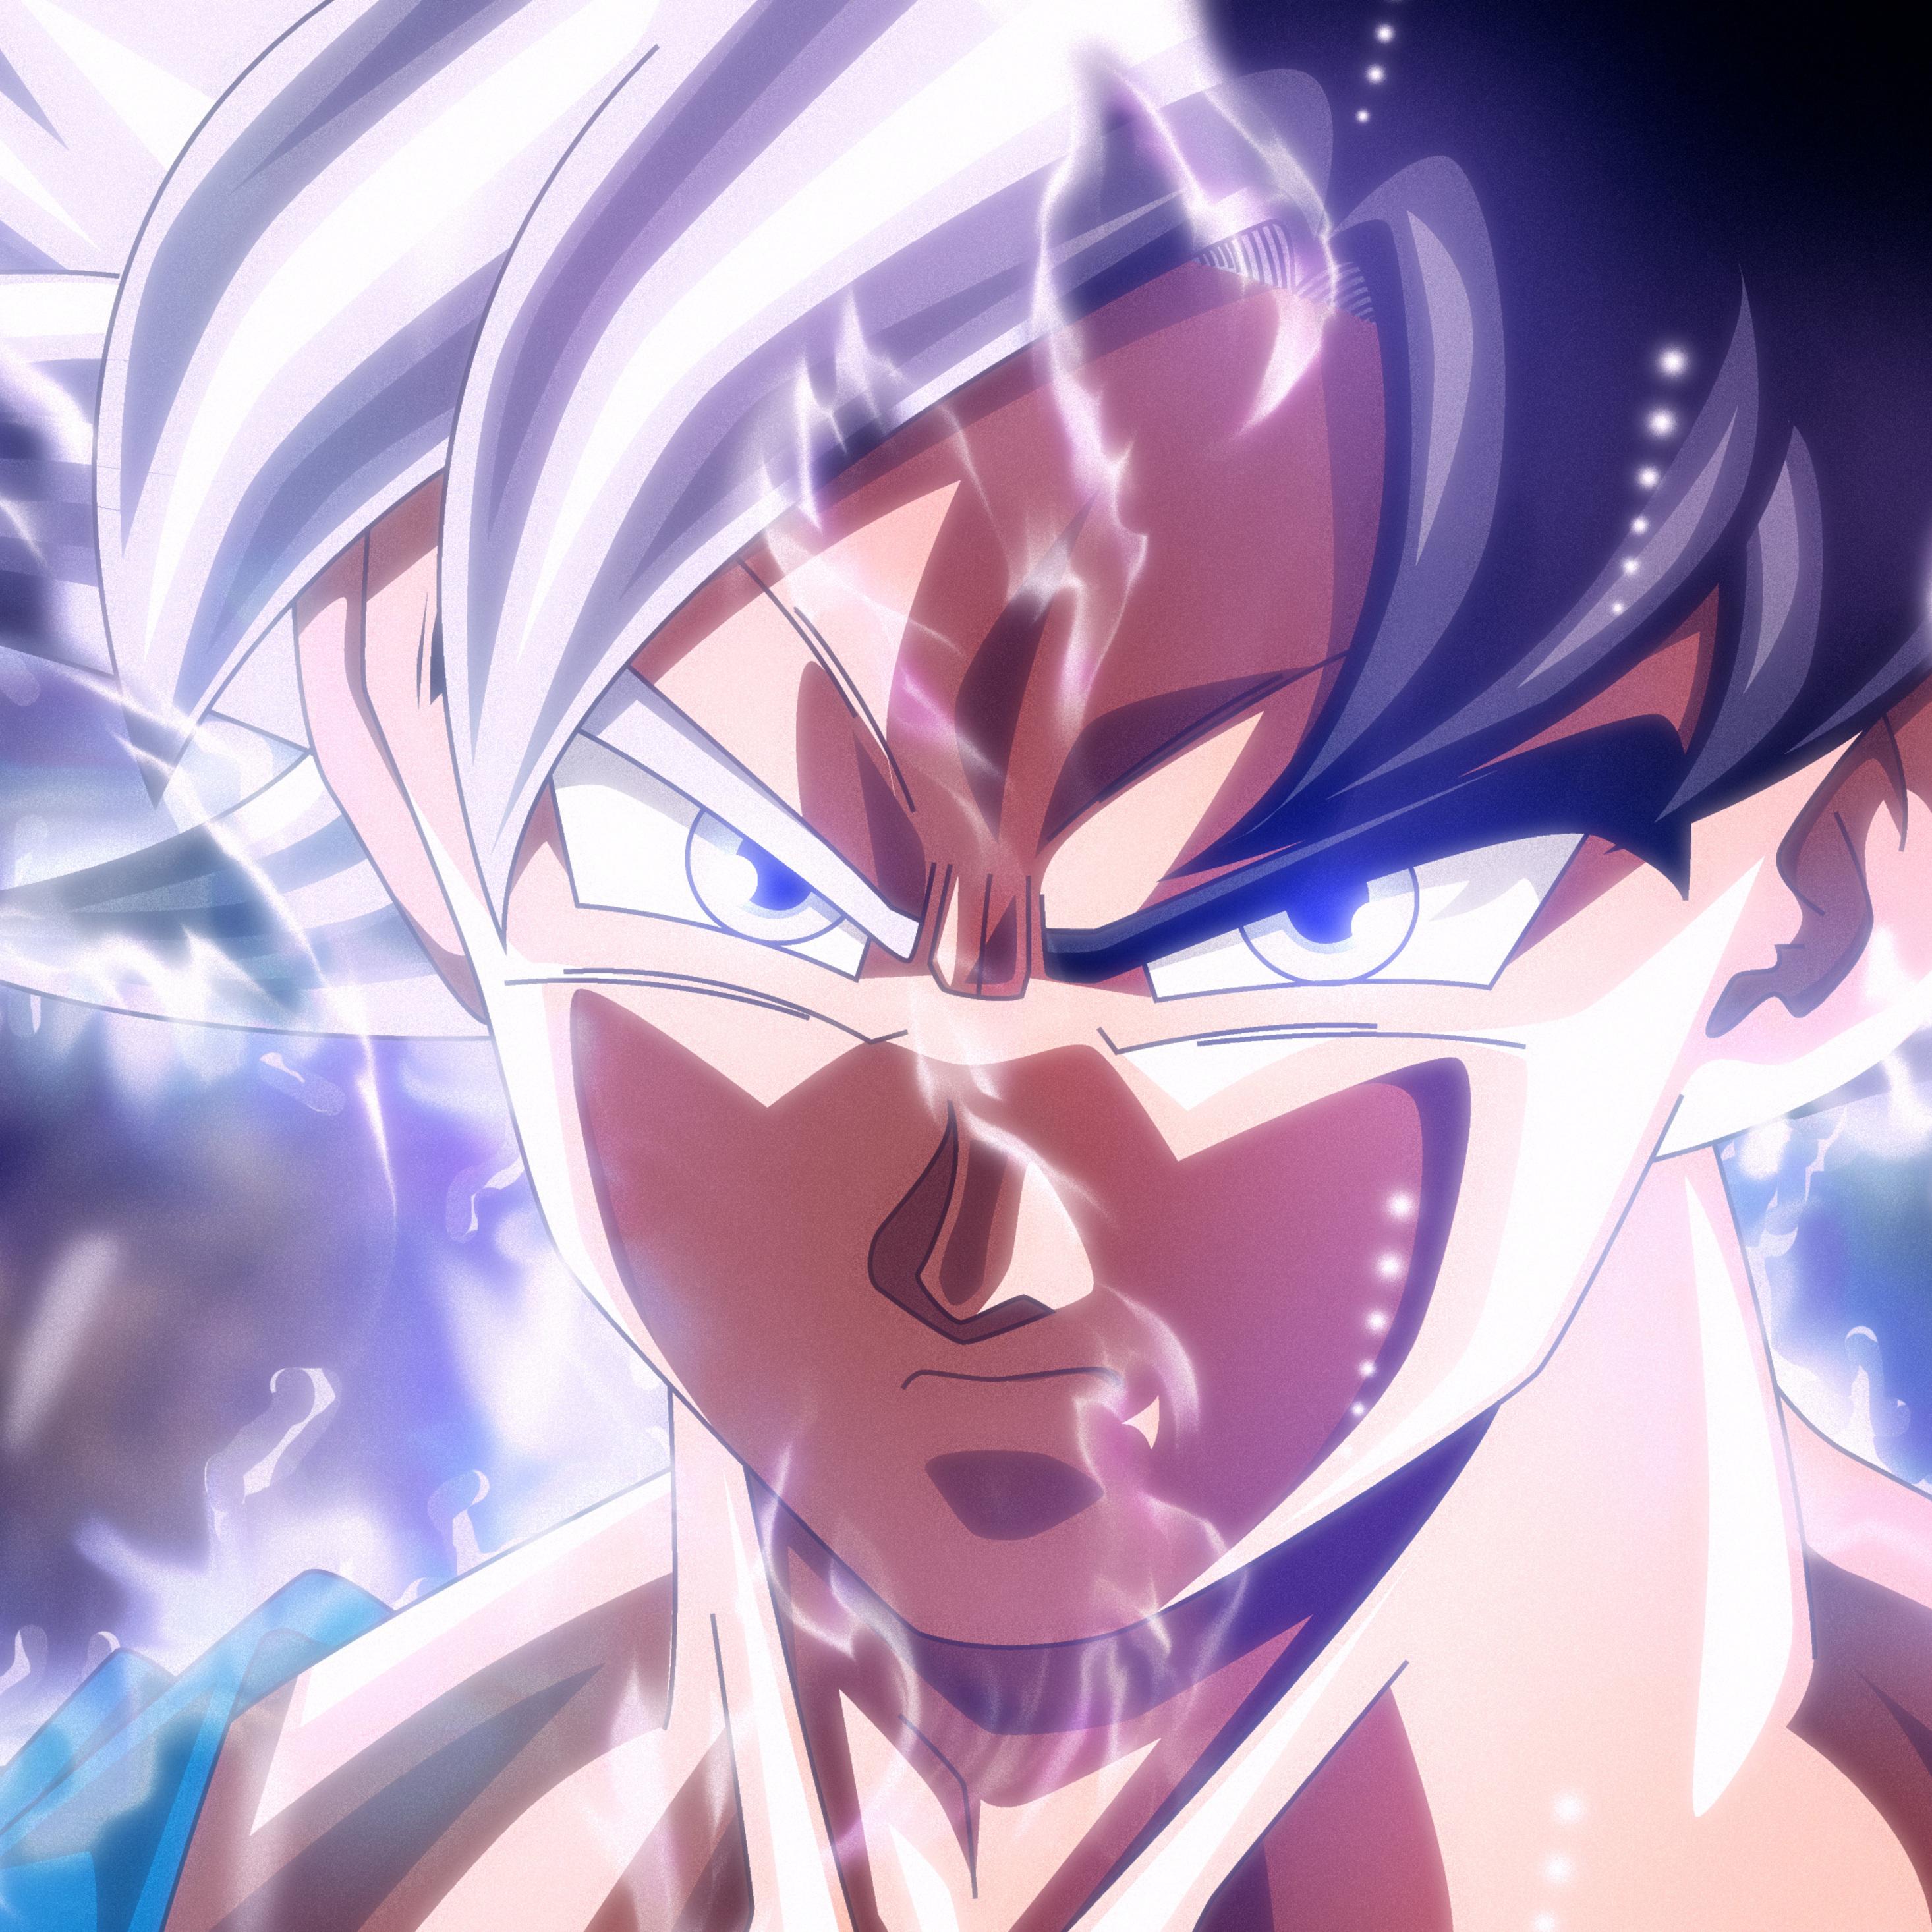 Ultra Instinct Dragon Ball Super Wallpaper: 2932x2932 Son Goku Mastered Ultra Instinct Ipad Pro Retina